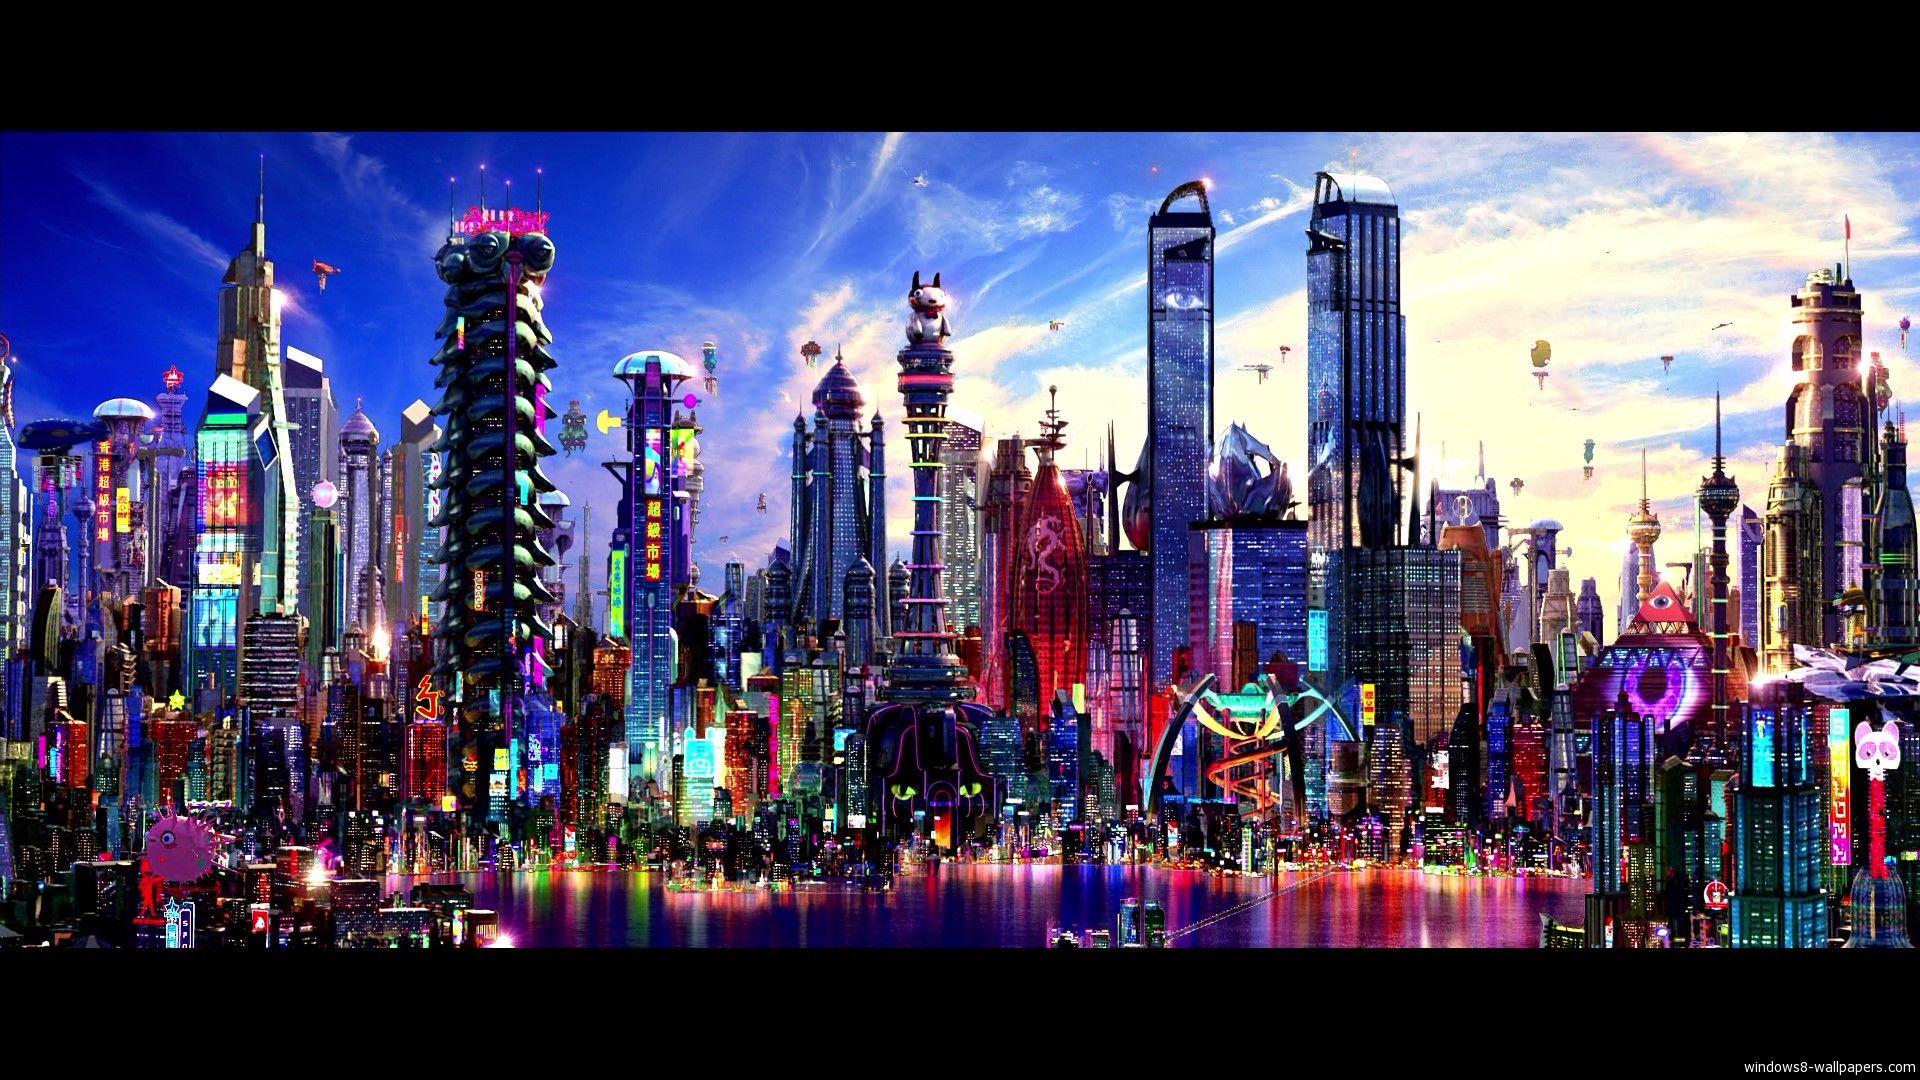 City With Colorful Buildings Colorful City Wallpaper Futuristic City Cityscape Wallpaper Cityscape